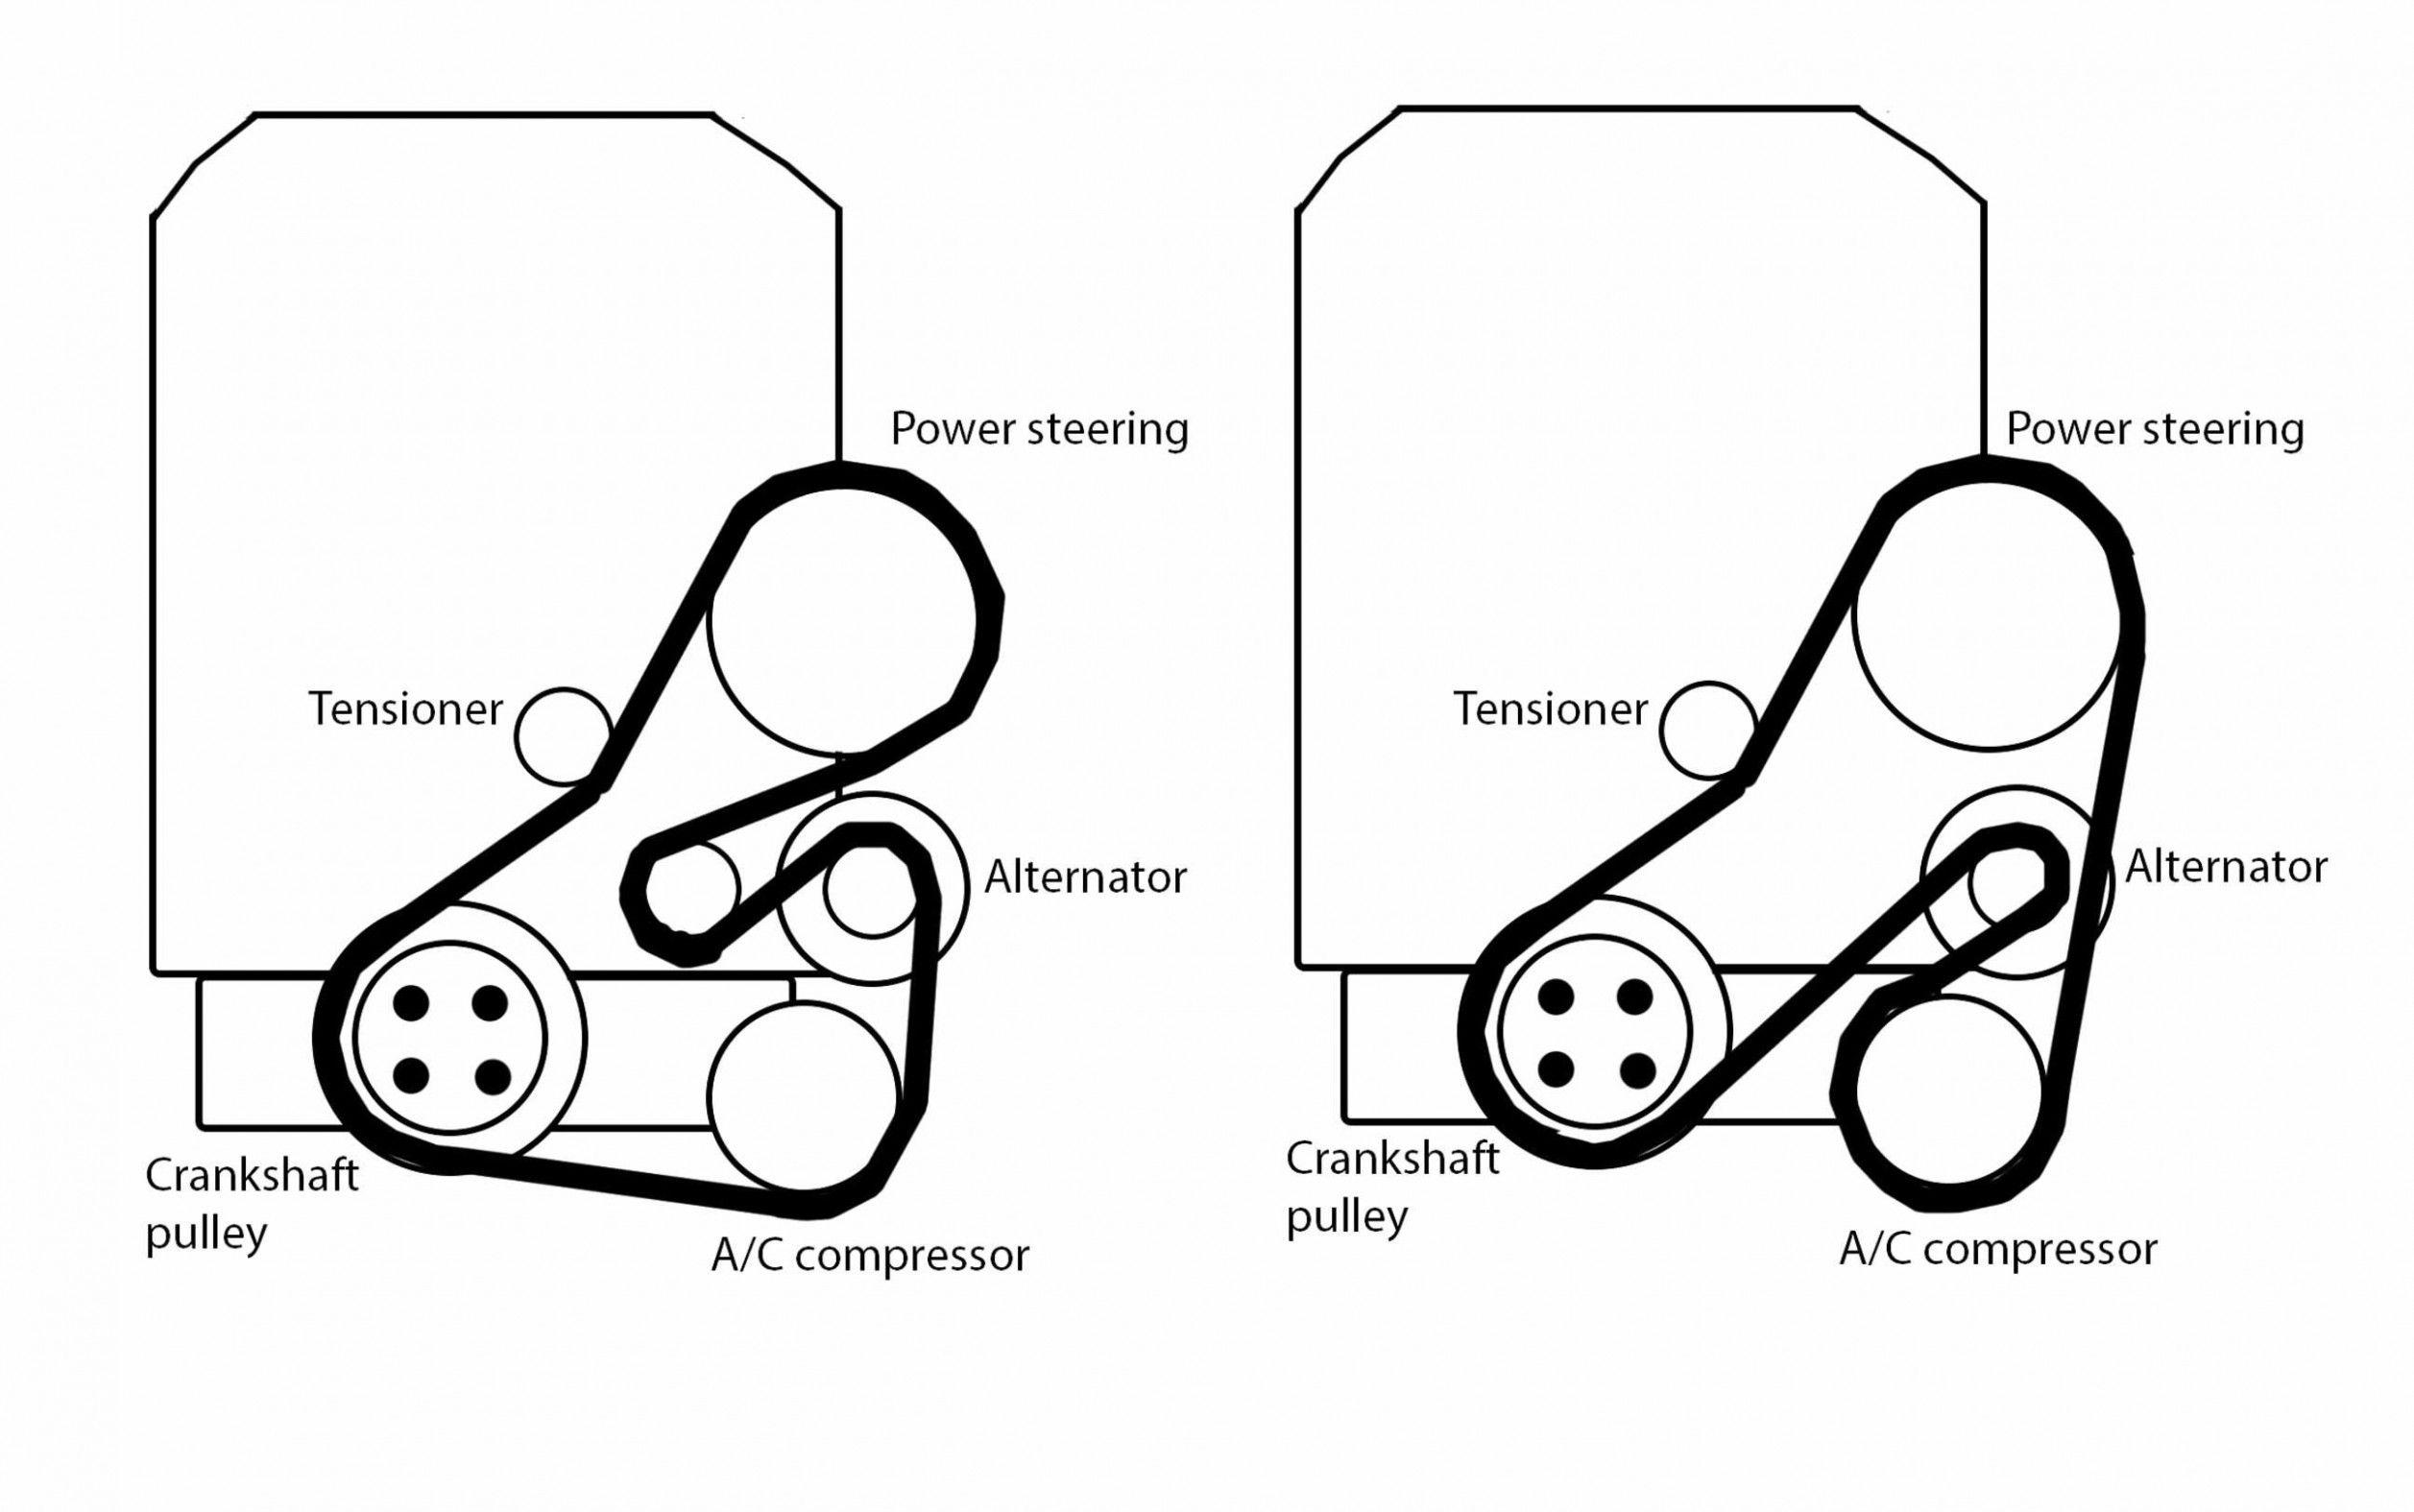 Engine Diagram Fan Belt di 2020